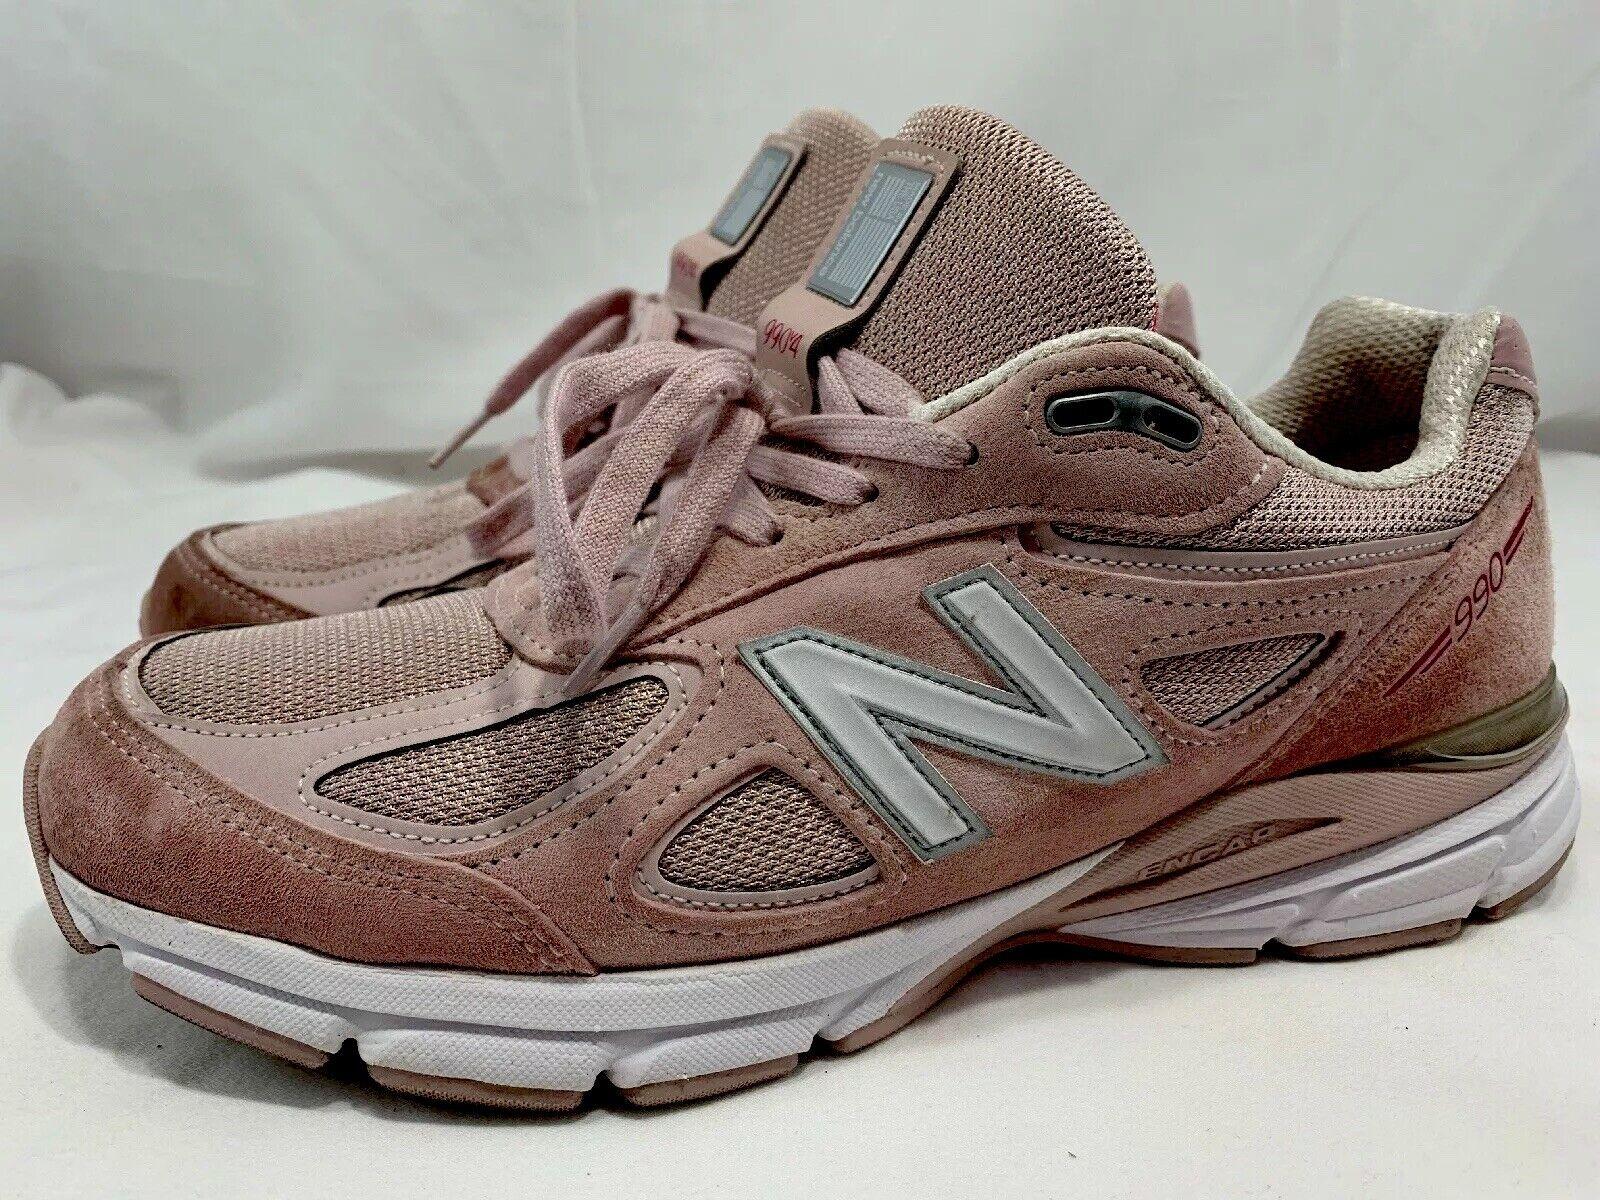 New Balance 990 V4 Pink Men's Running Dad shoes Sz 9.5 Made USA Faded pink Komen